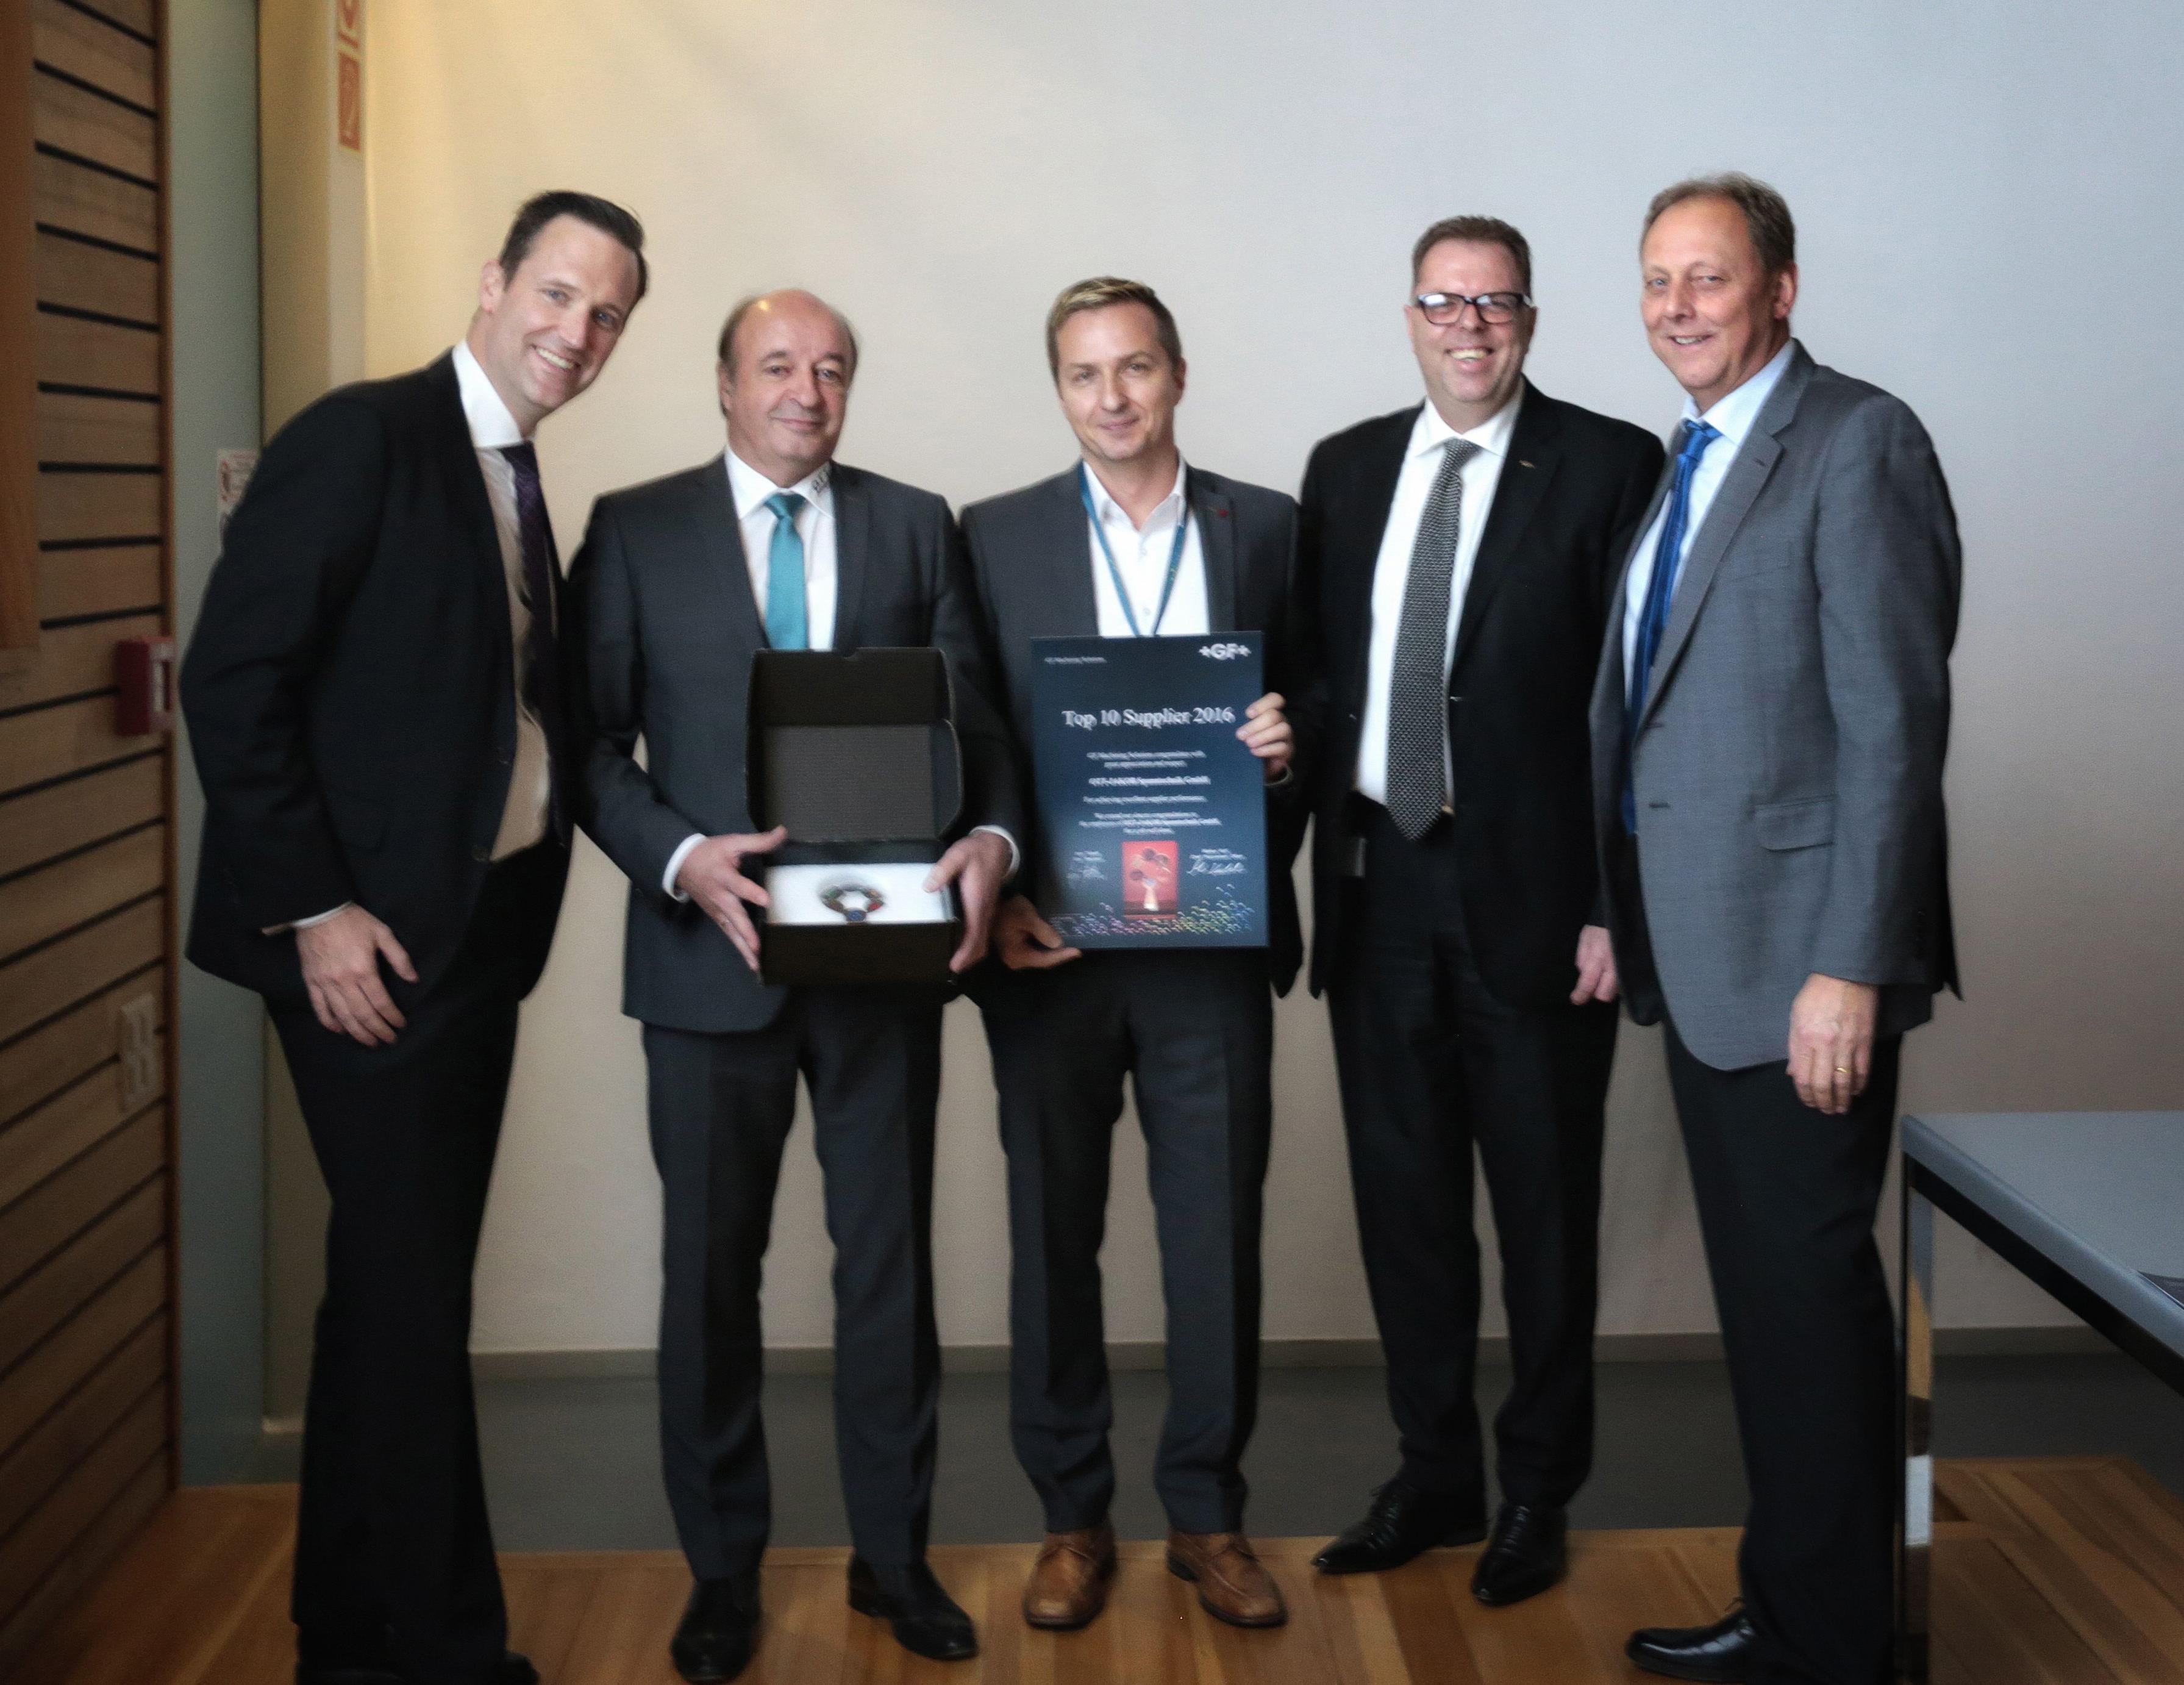 Ott Jakob - Unternehmen - Bild - OTT-JAKOB receives supplier award